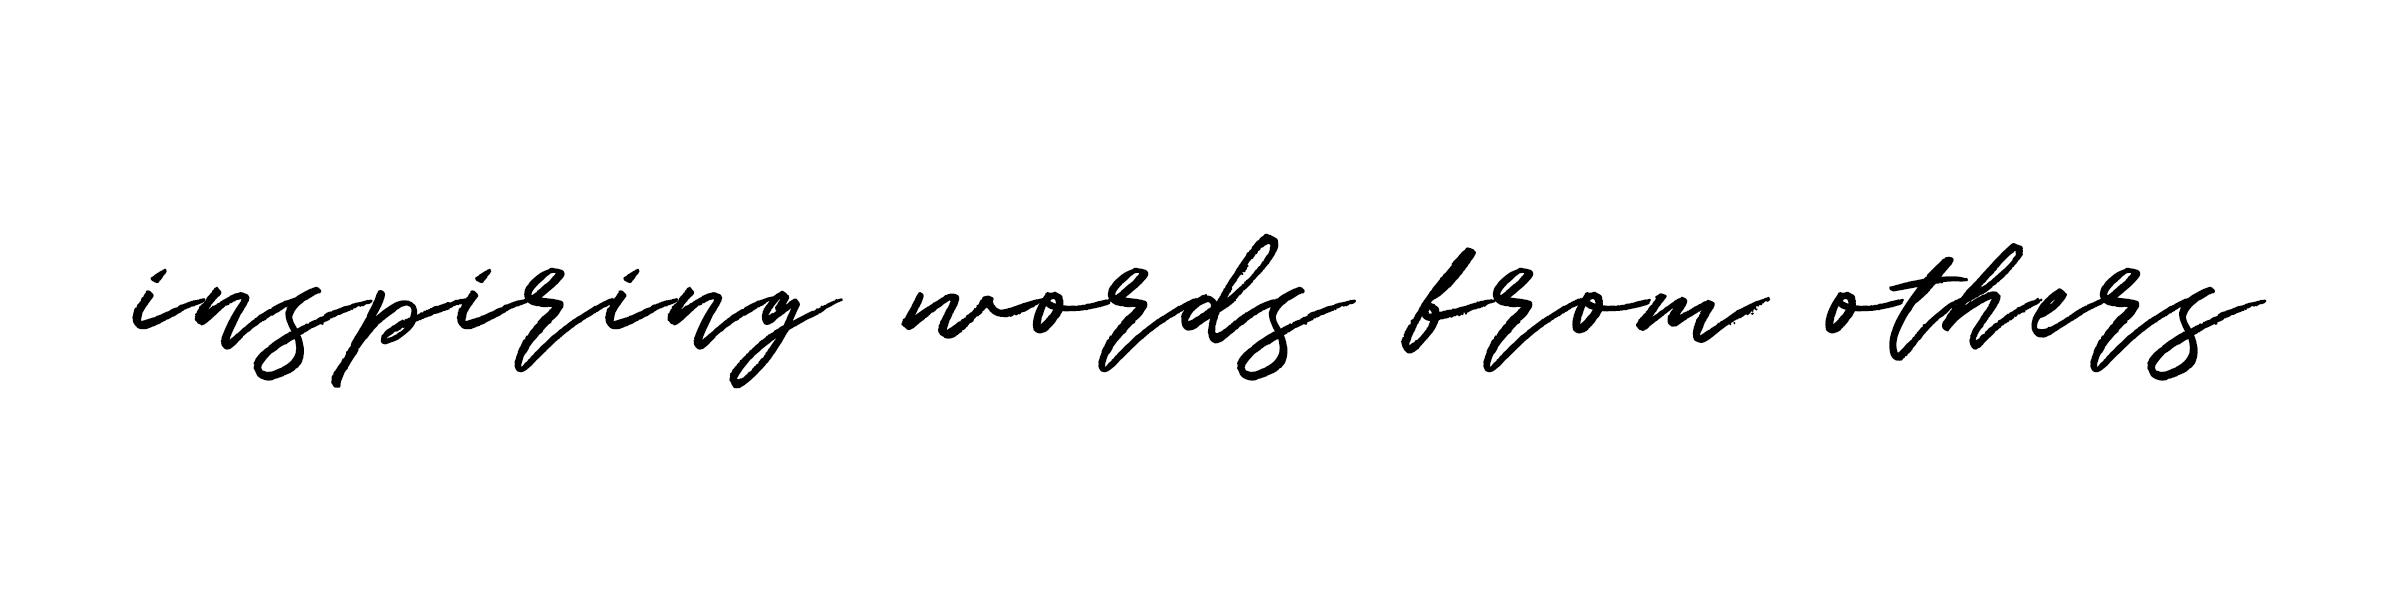 inspiringwords.png